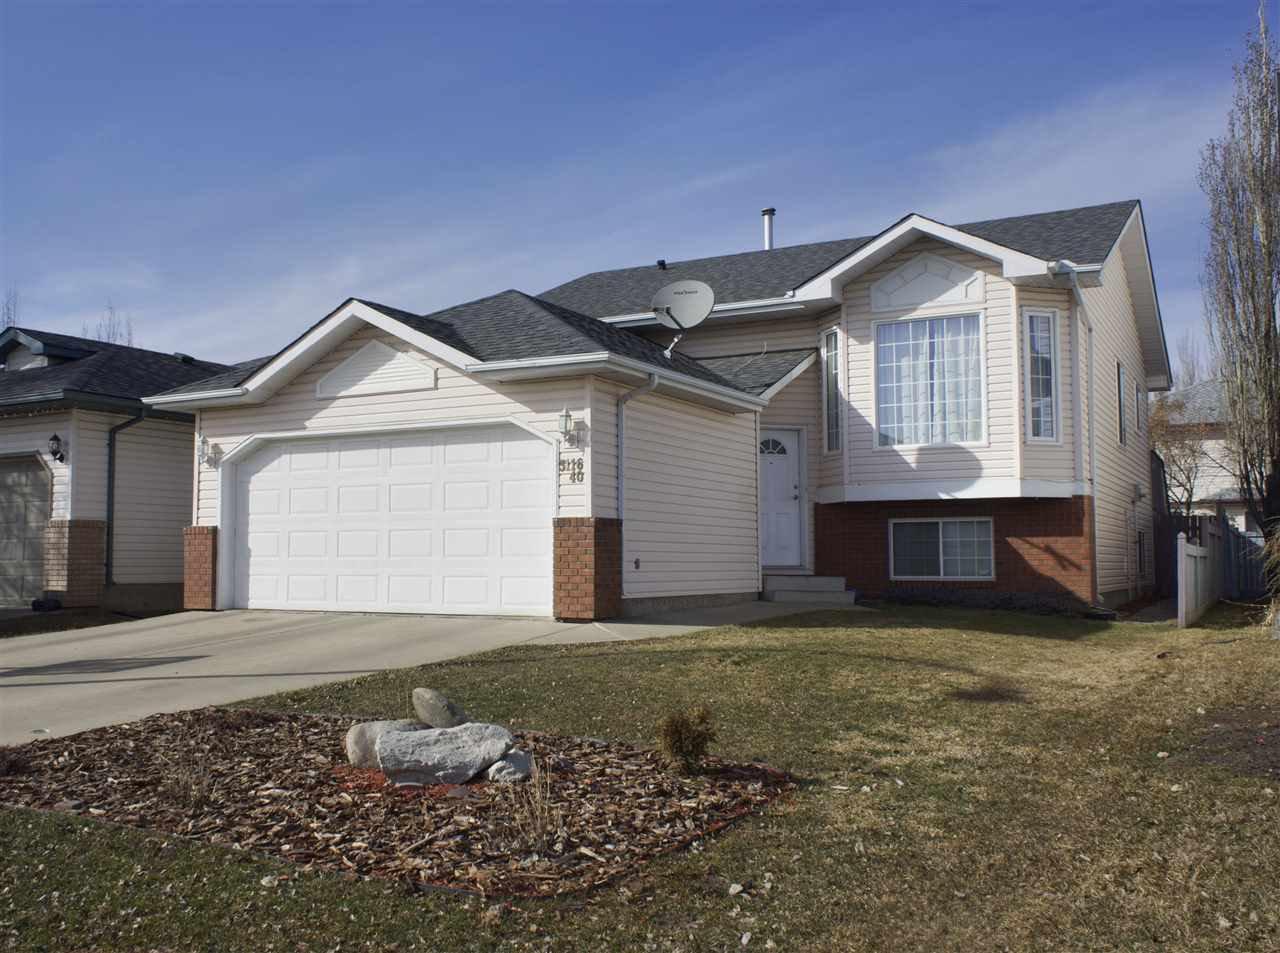 Main Photo: 3116 40 Avenue in Edmonton: Zone 30 House for sale : MLS®# E4173873